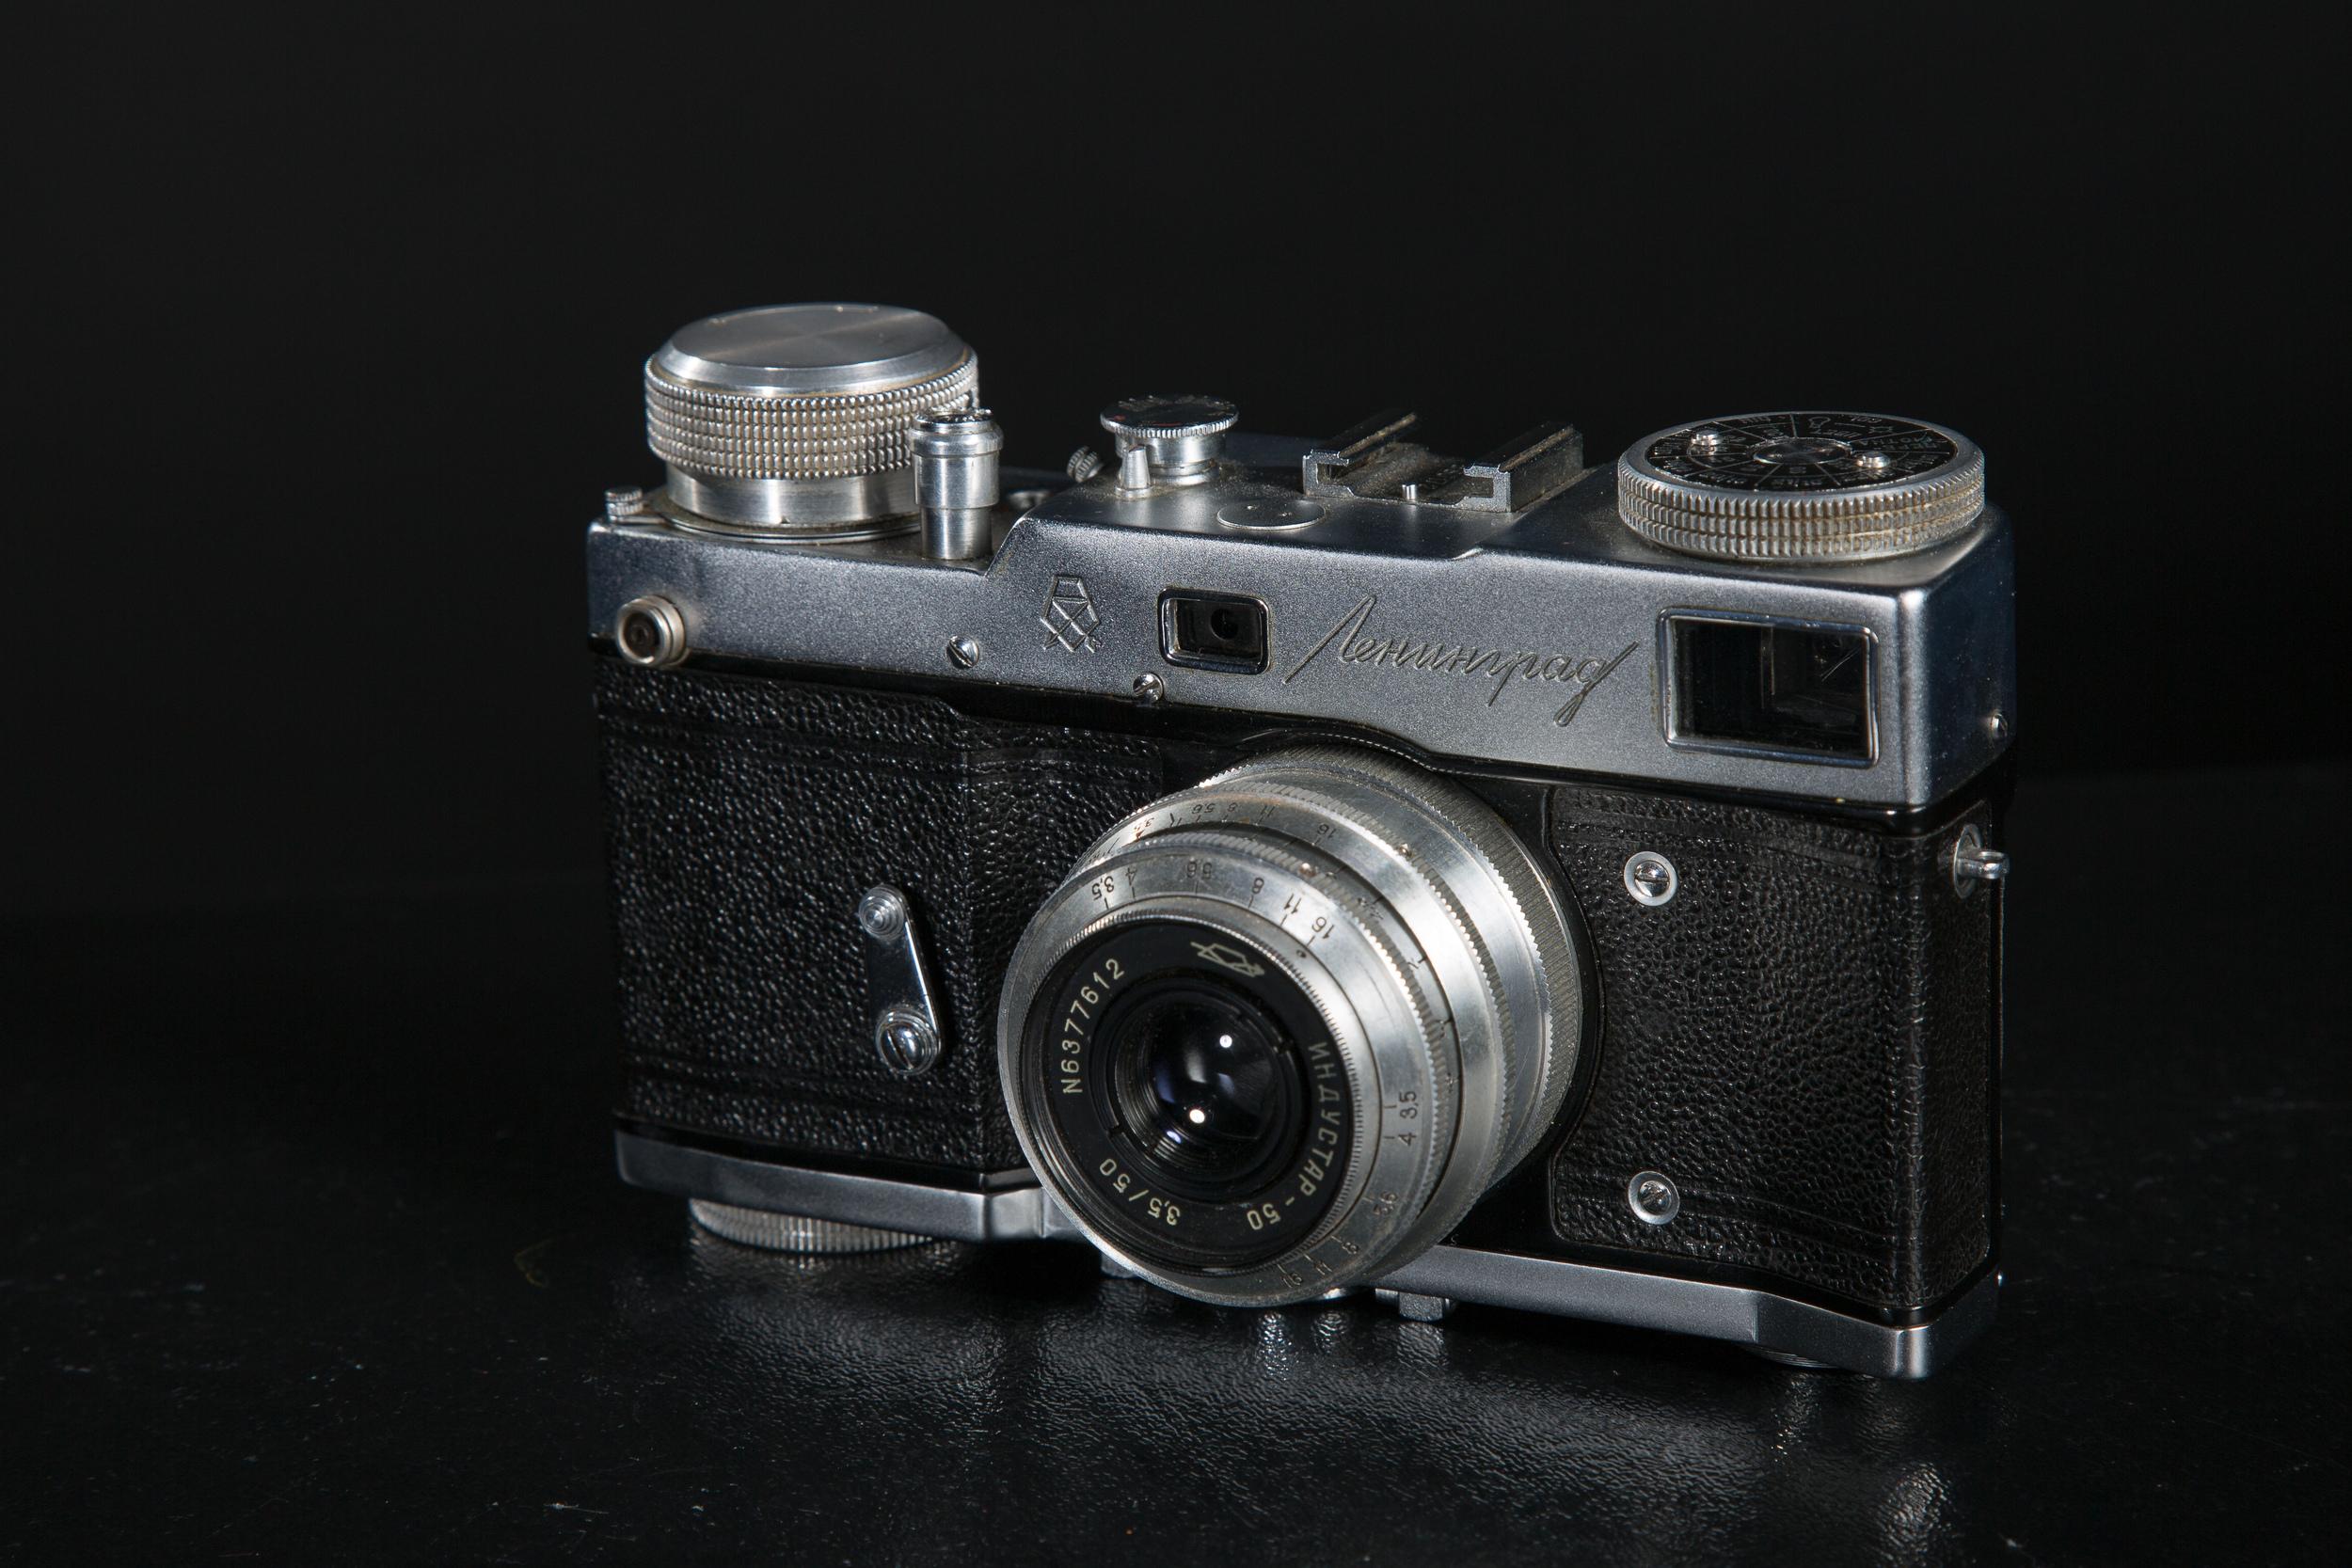 Leningrad Rangefinder low key